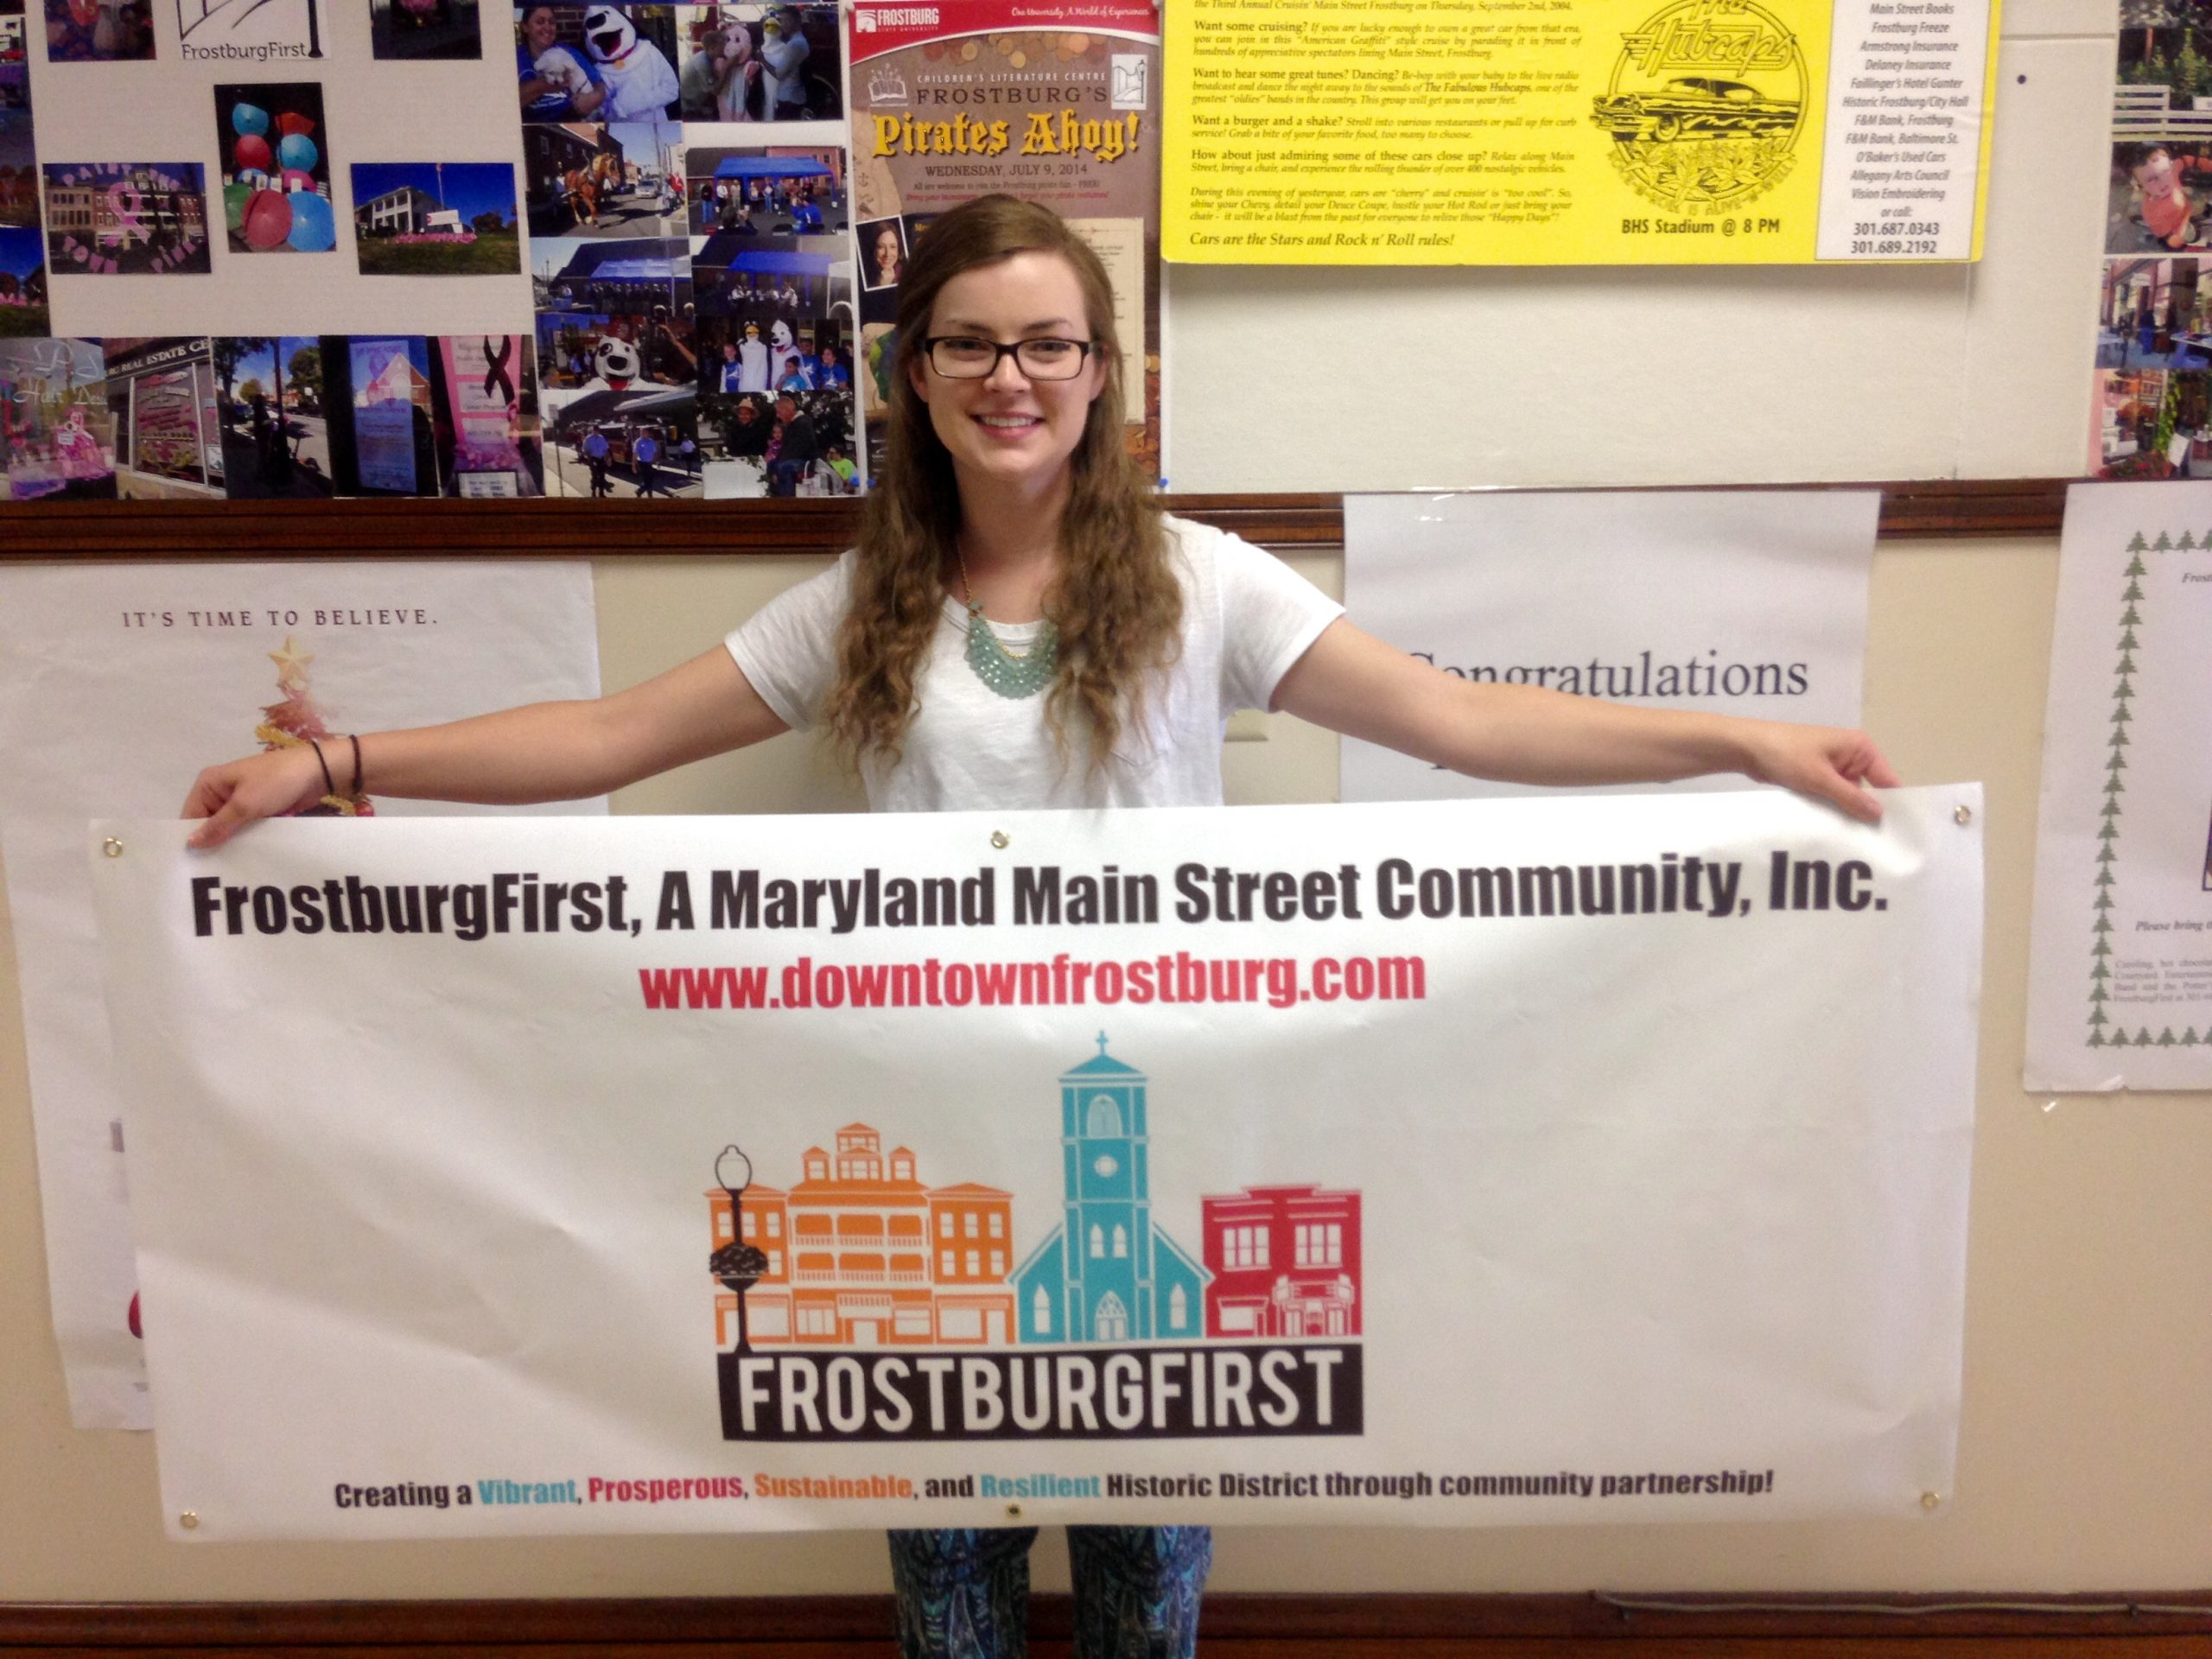 Frostburgfirst Chooses Fsu Student Megan Dignan's Logo With Regard To Frostburg School Calendar